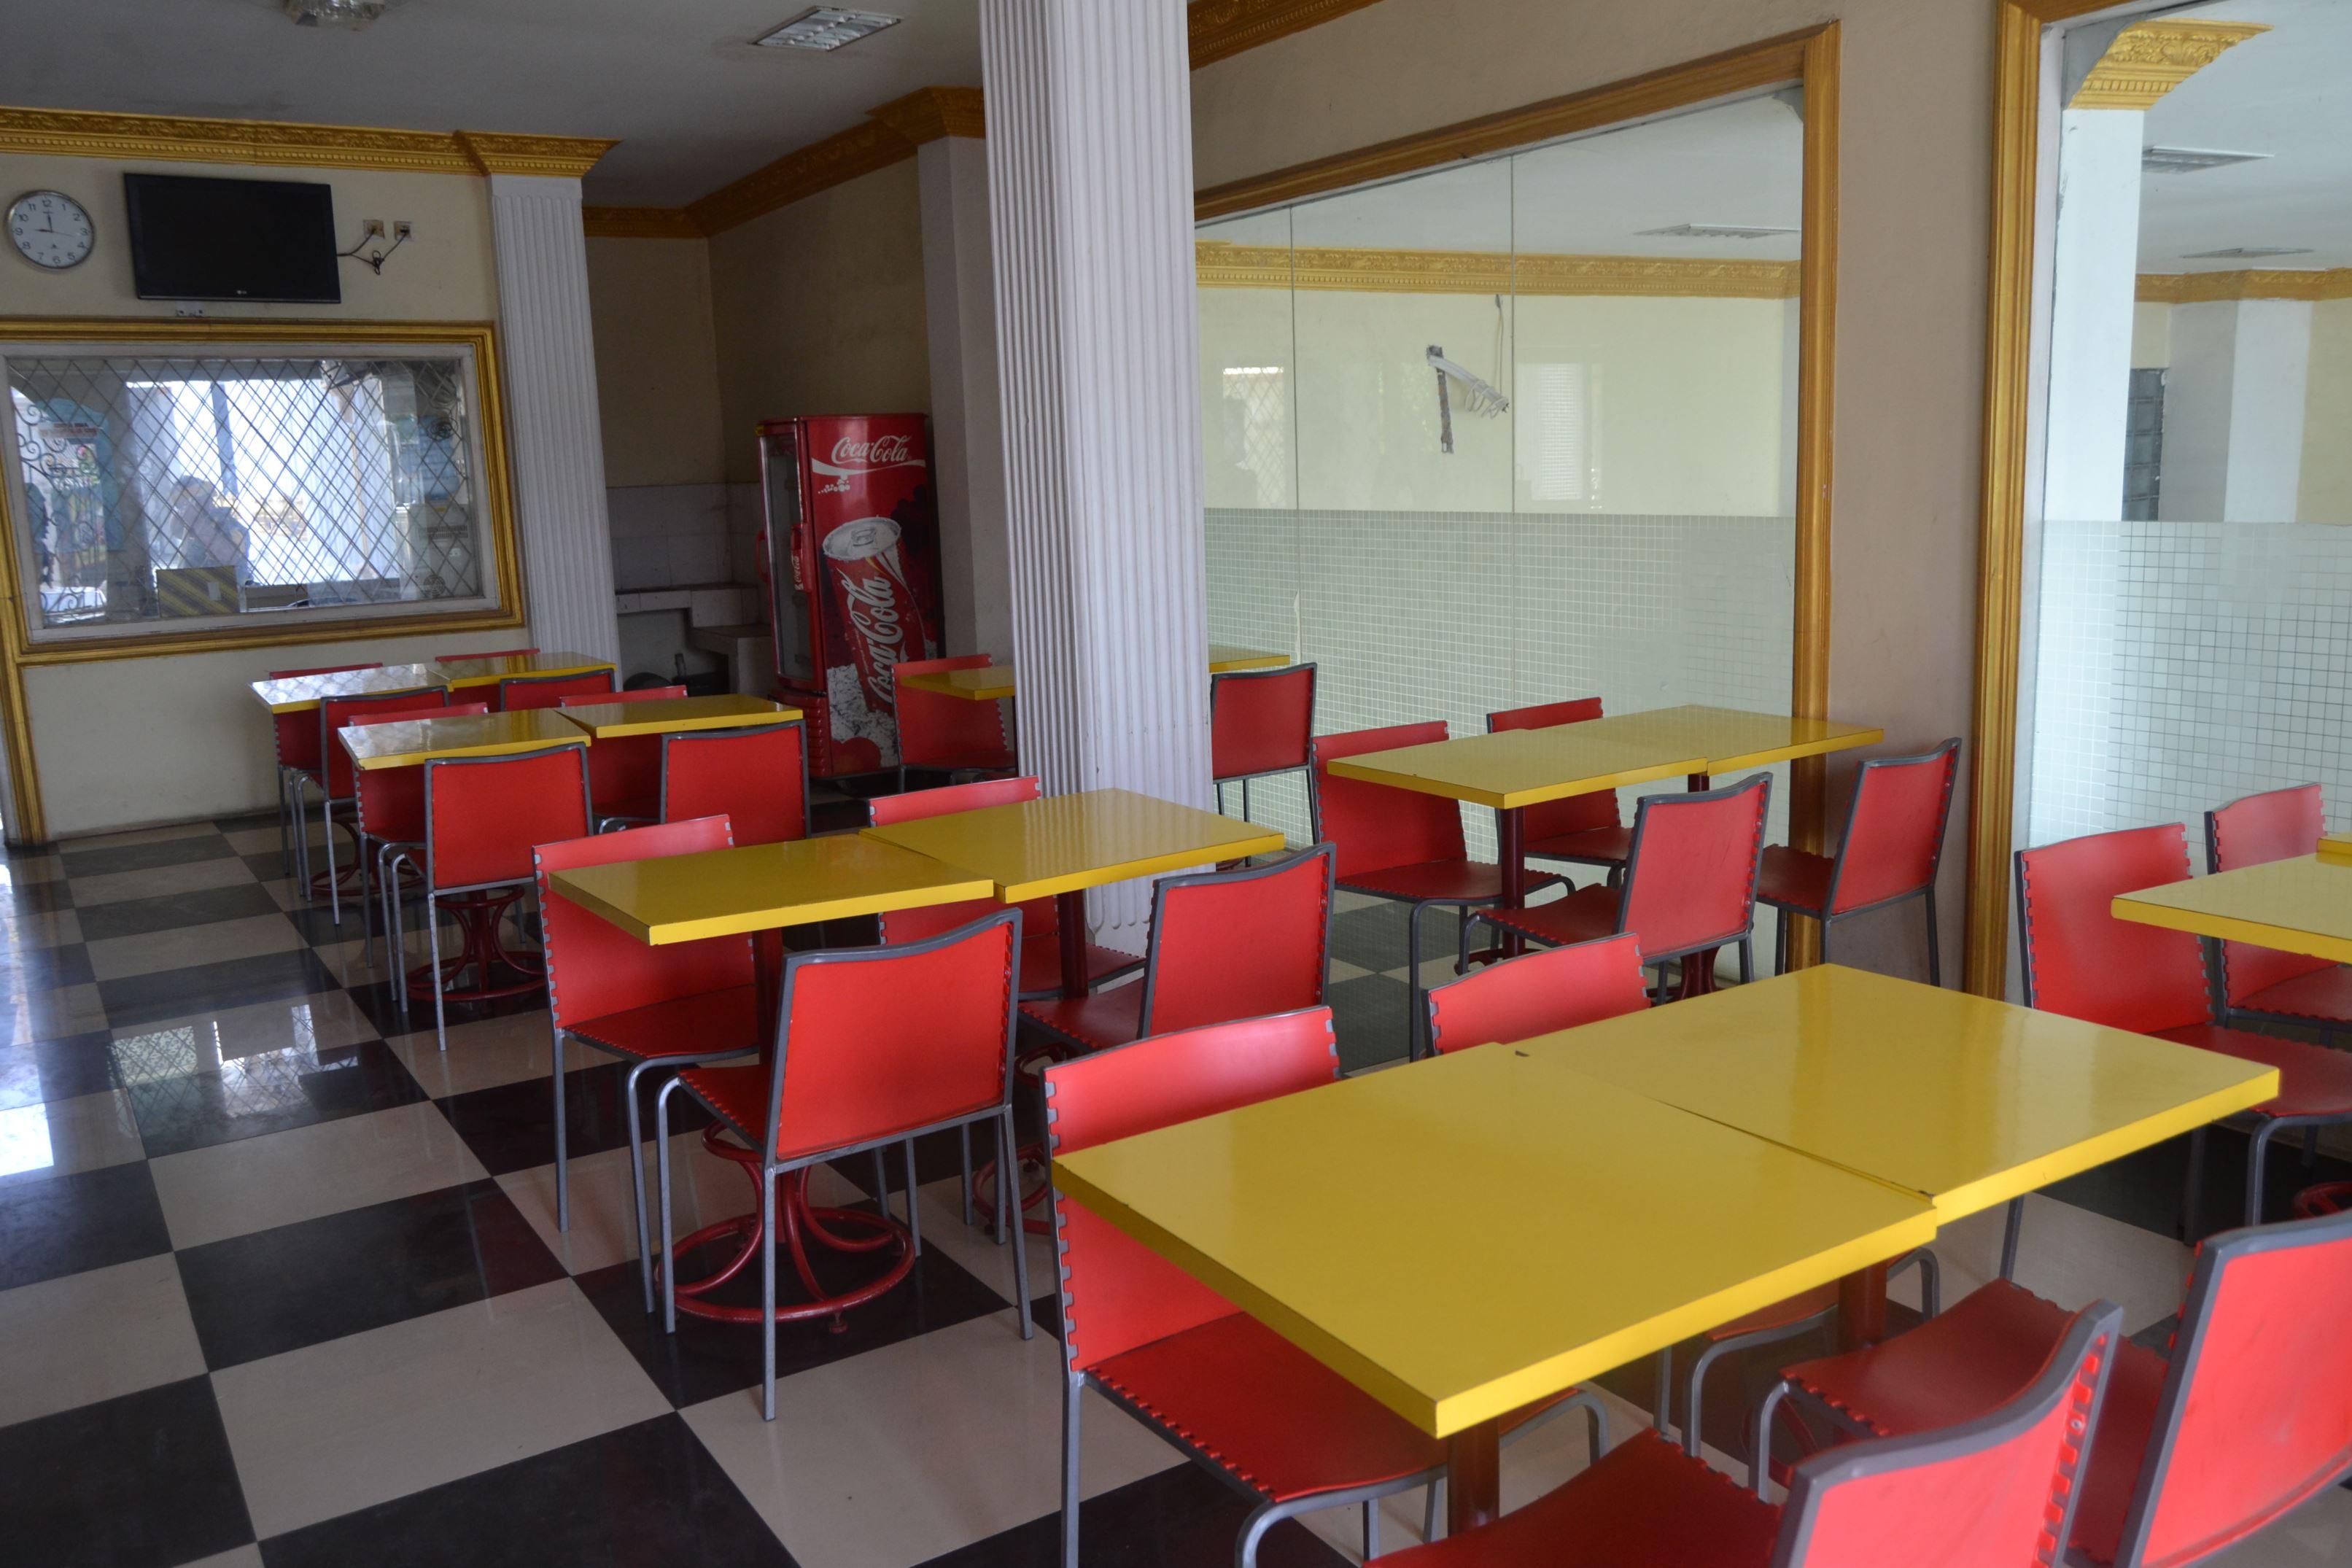 Alexandria Islamic School Cafetaria Facilities Ruang Makan